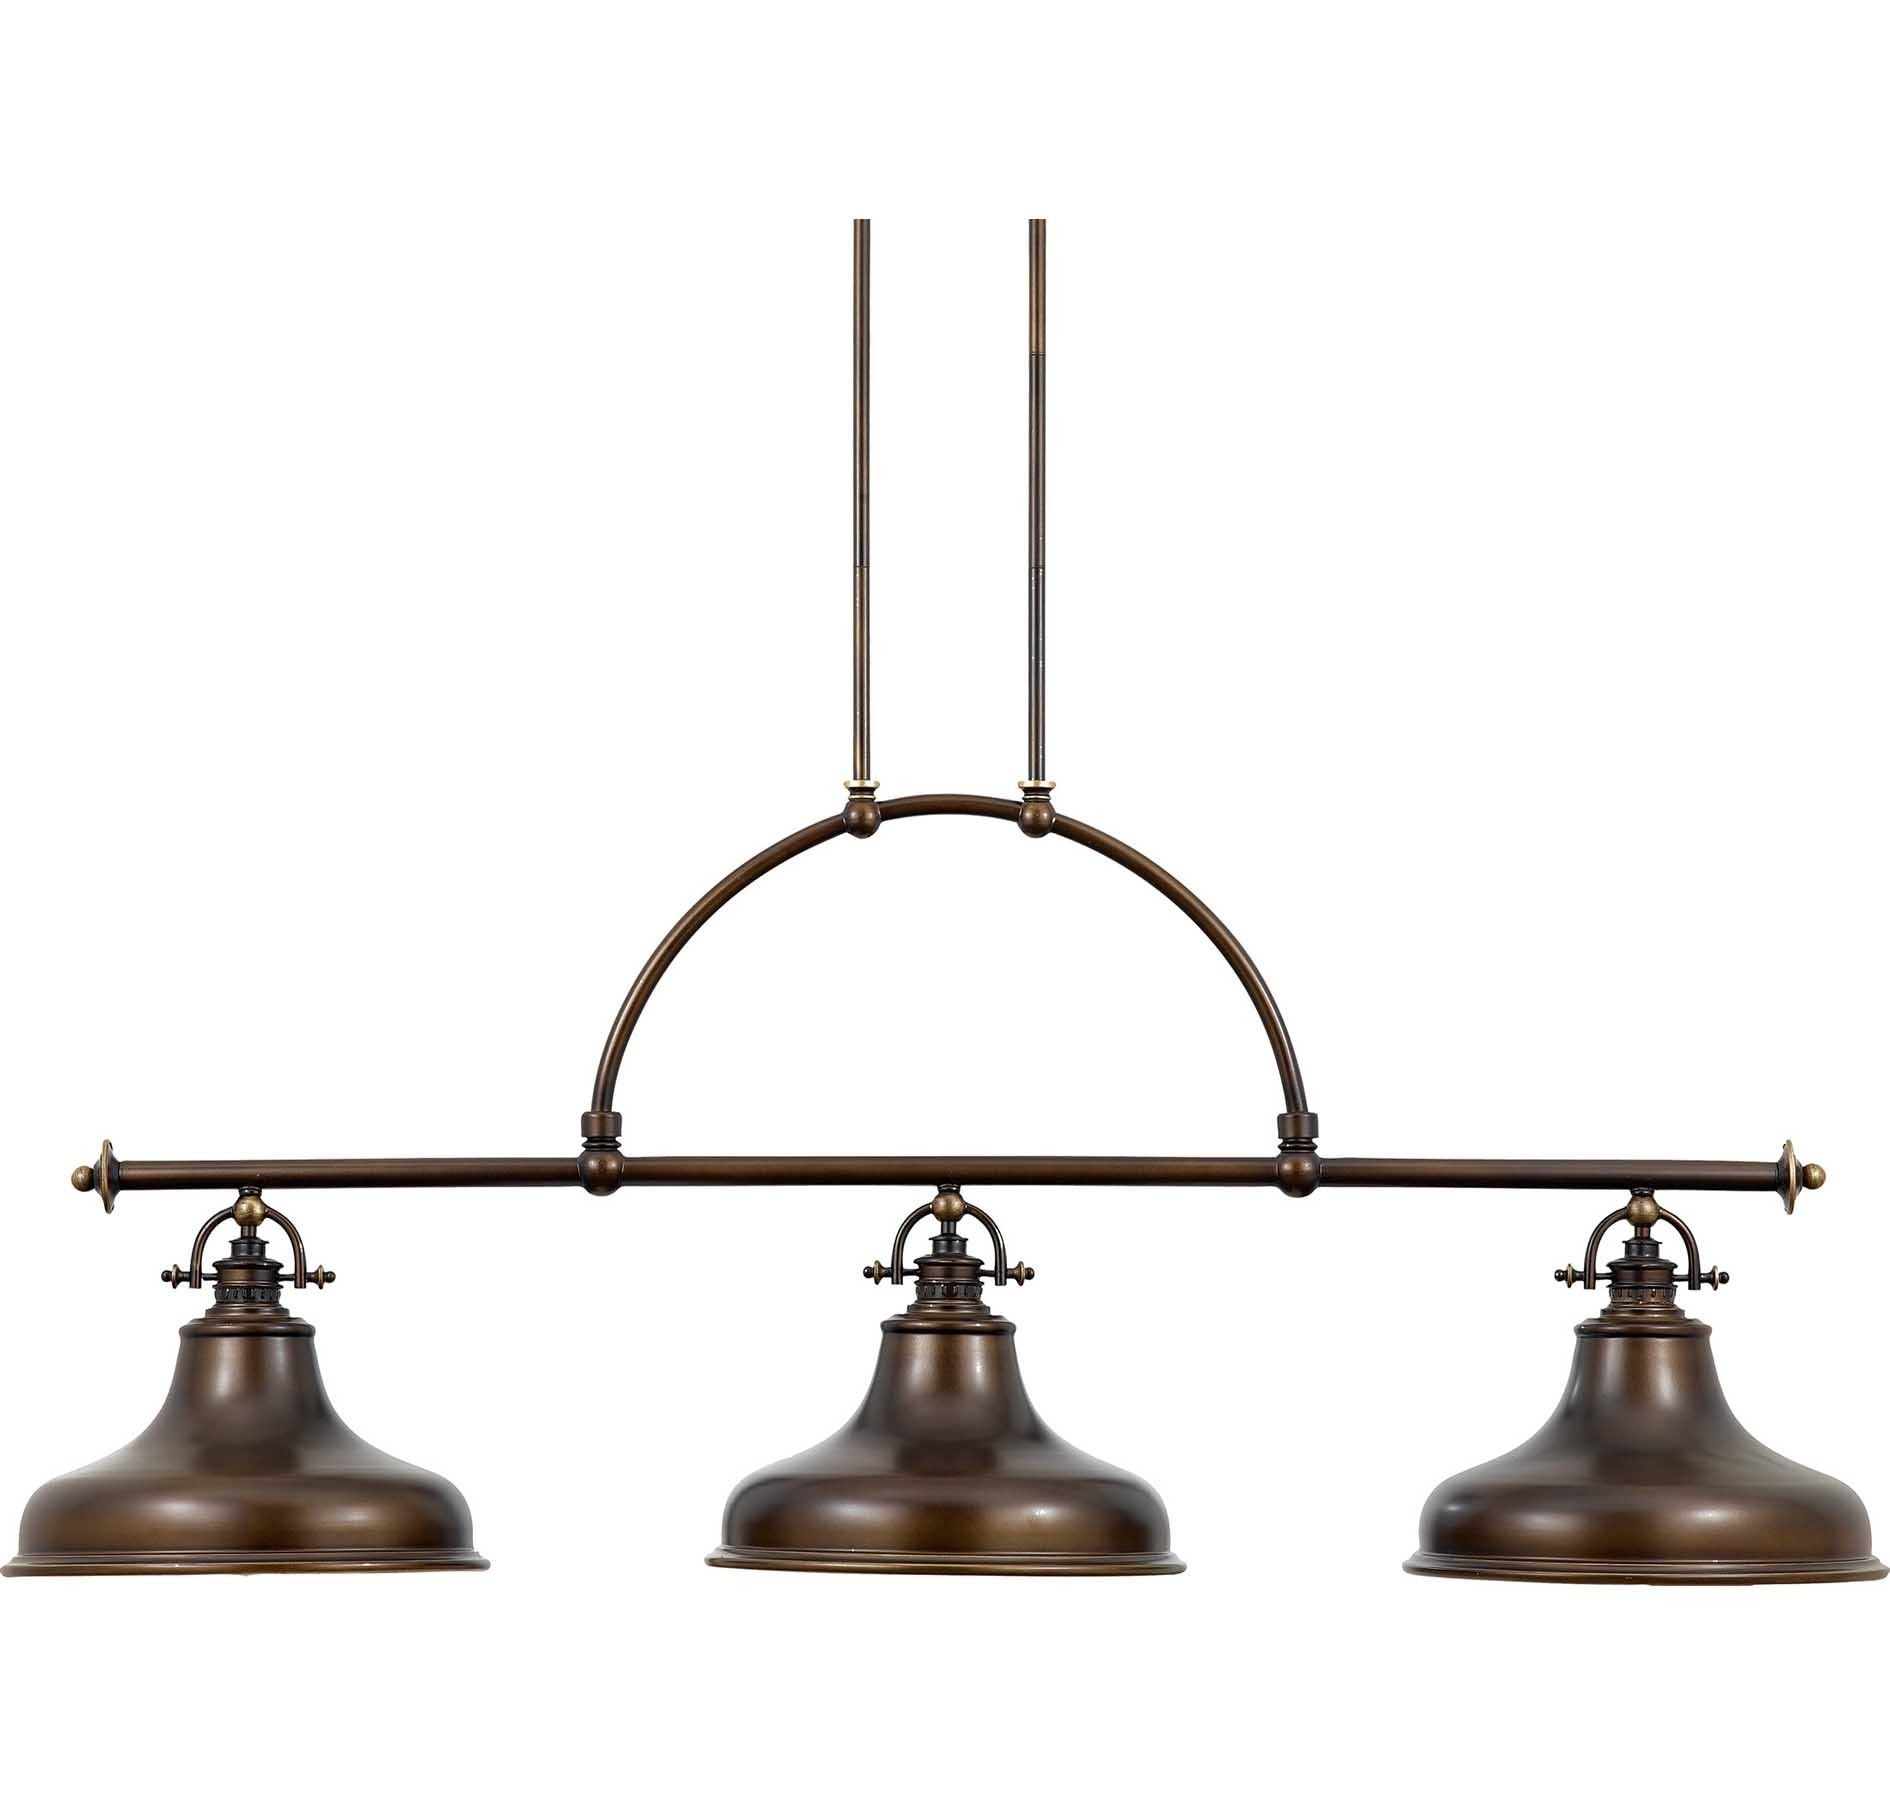 Quoizel emery island chandelier in bronze chandeliers ceilings quoizel emery island chandelier in bronze arubaitofo Gallery